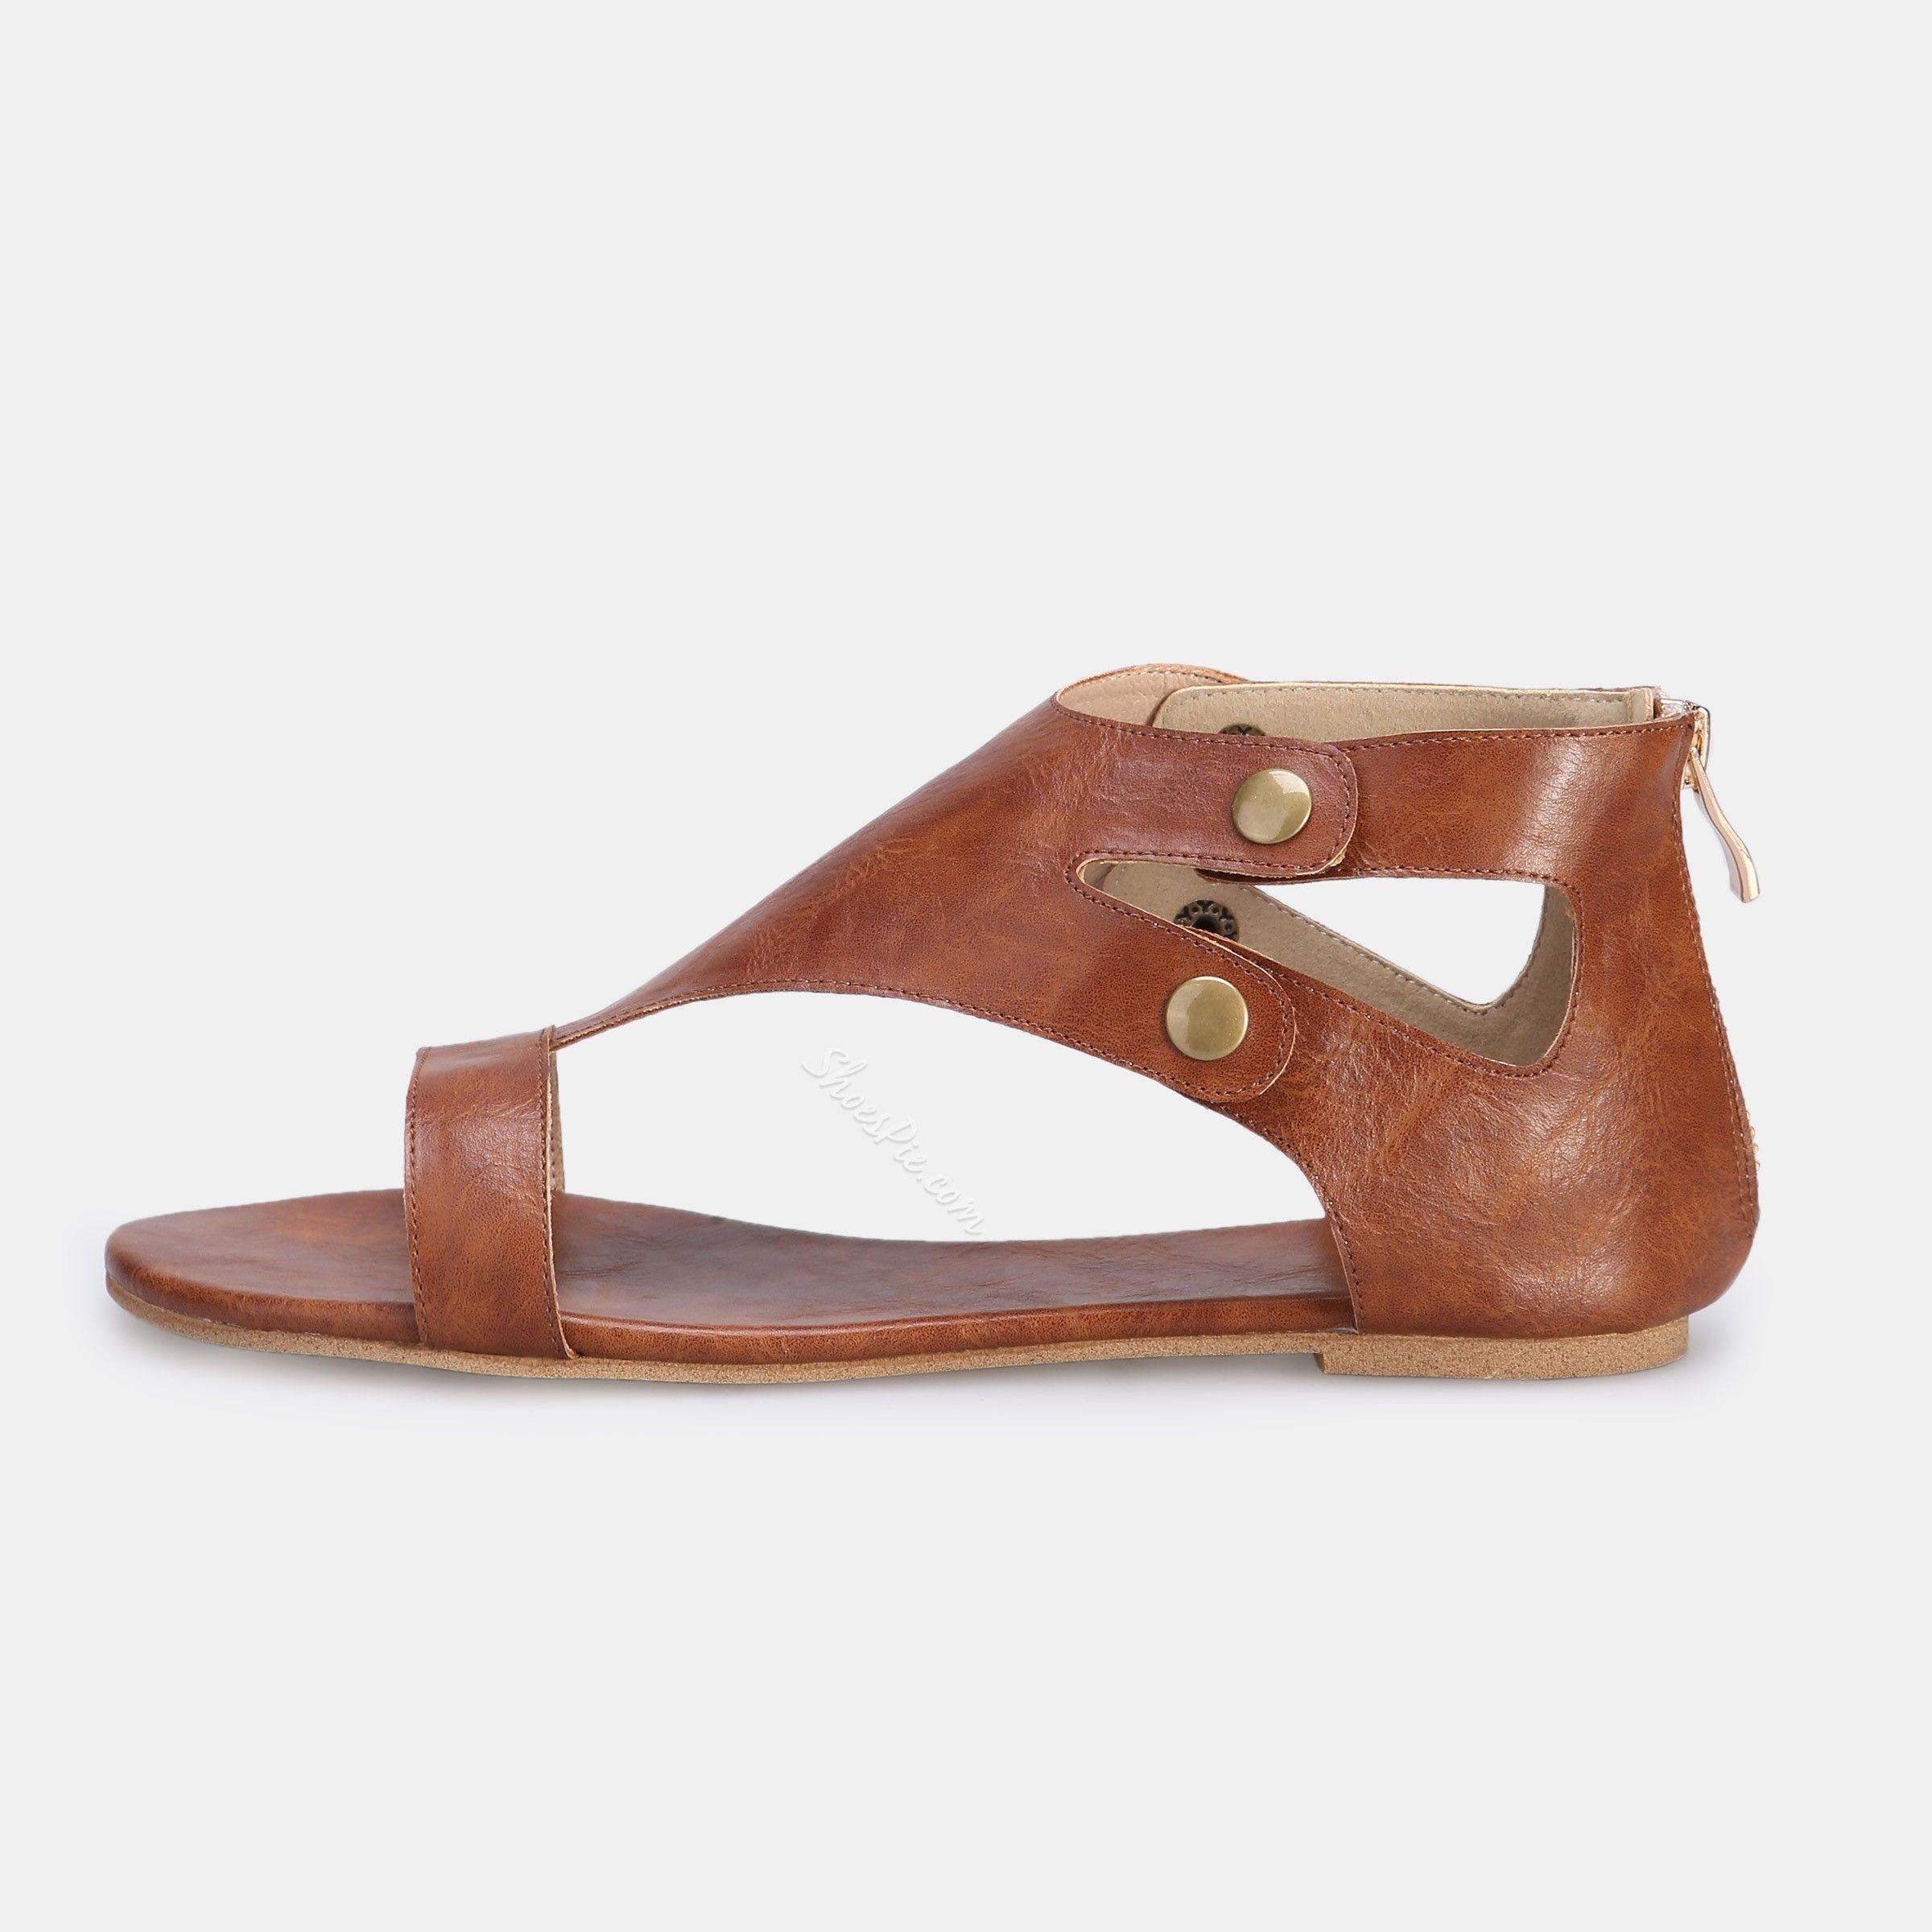 Shoespie Brown Rivets Heel Covering Flat Sandals Ad Rivets Ad Brown Shoespie Heel Heel Covers Shoespie Sandals